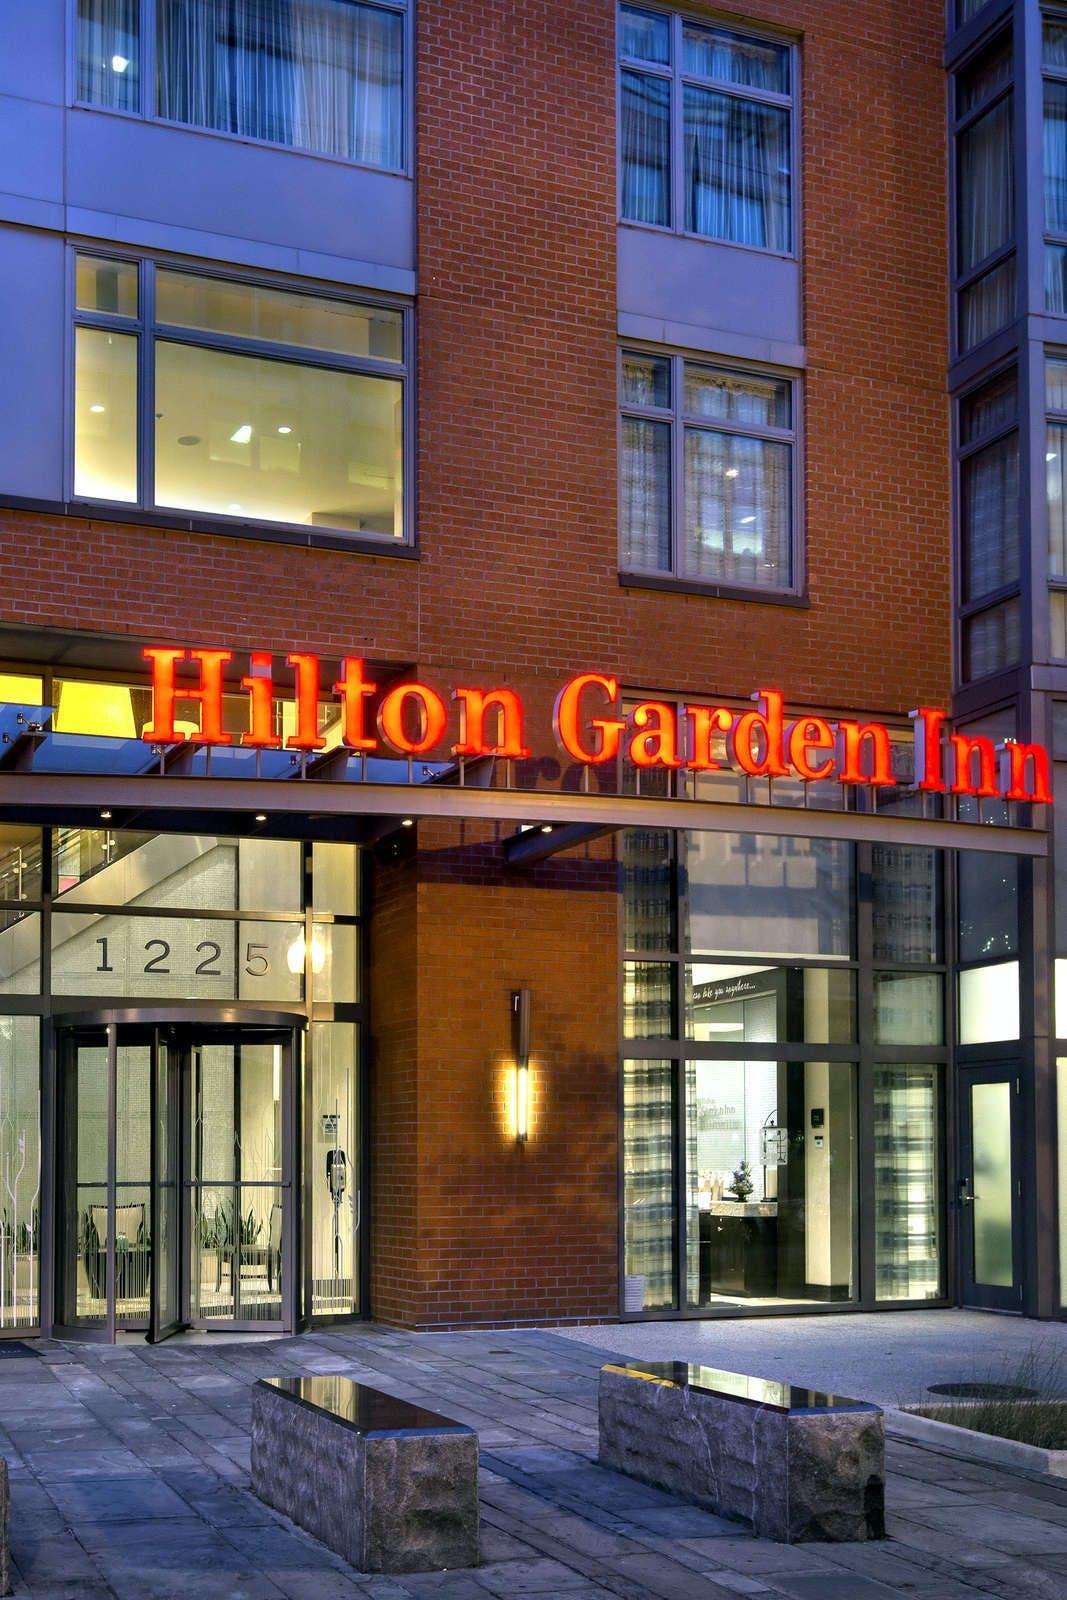 Hilton Garden Inn Washington DC/U.S. Capitol